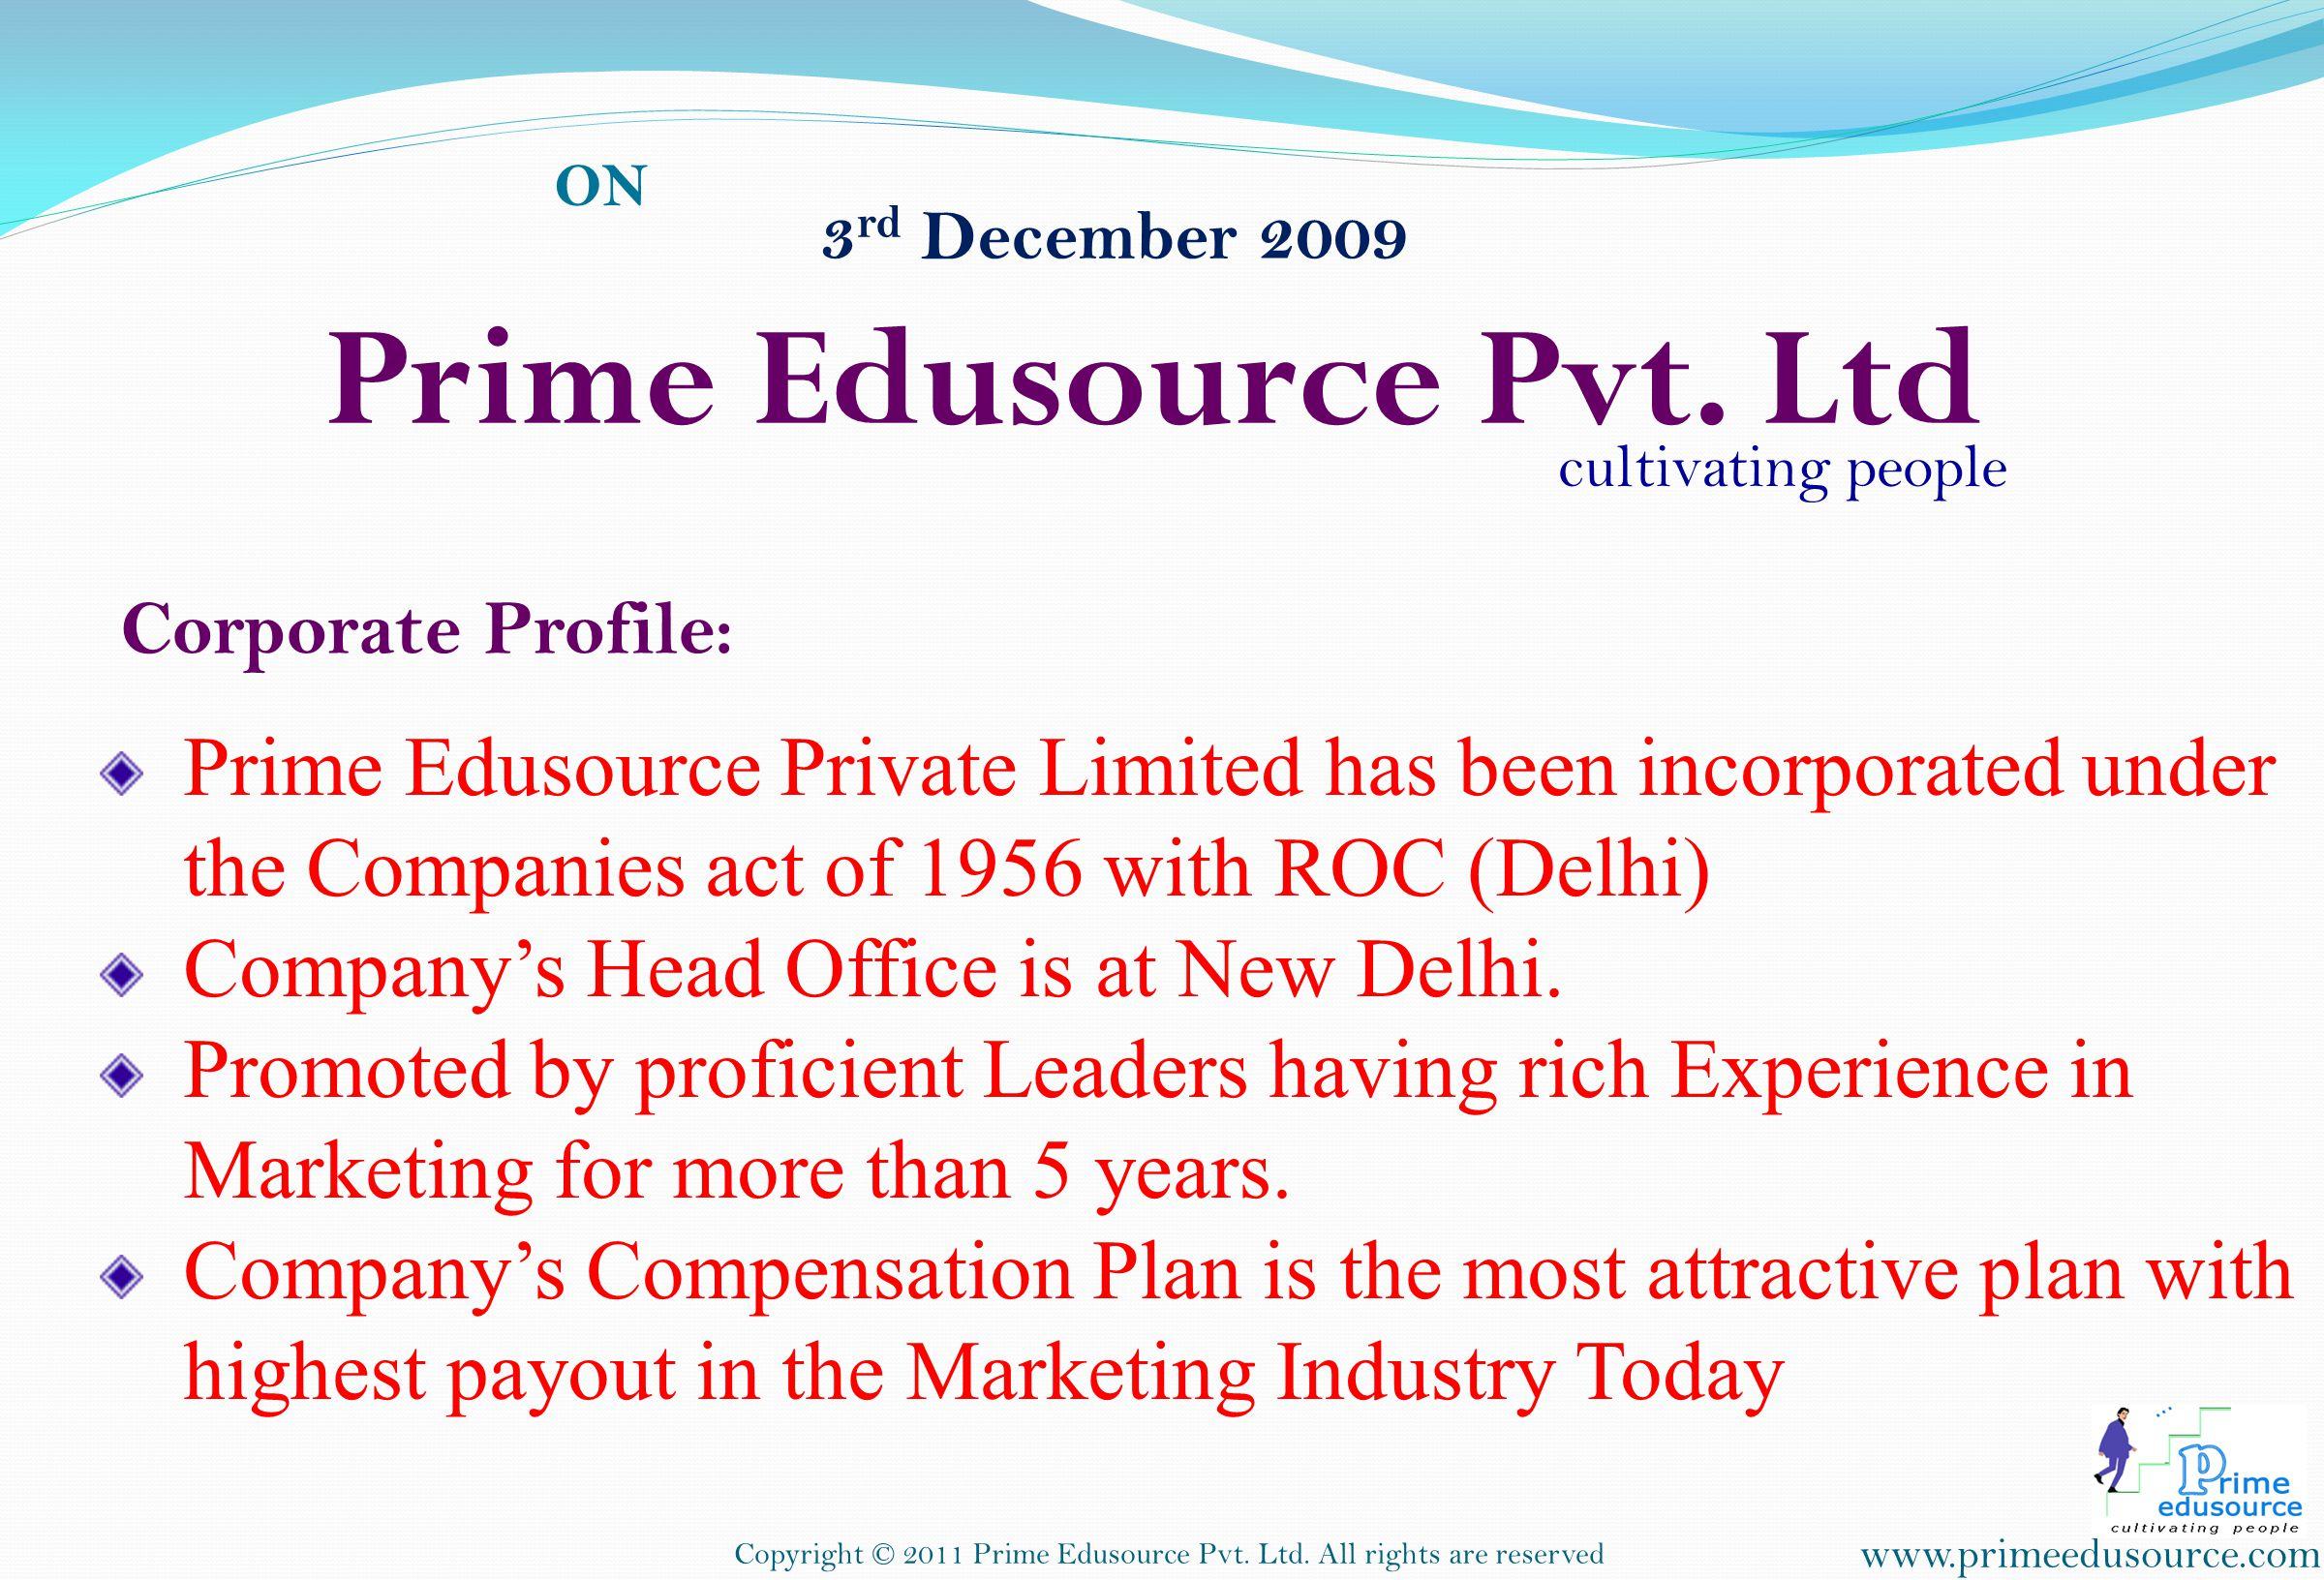 Prime Edusource Pvt. Ltd